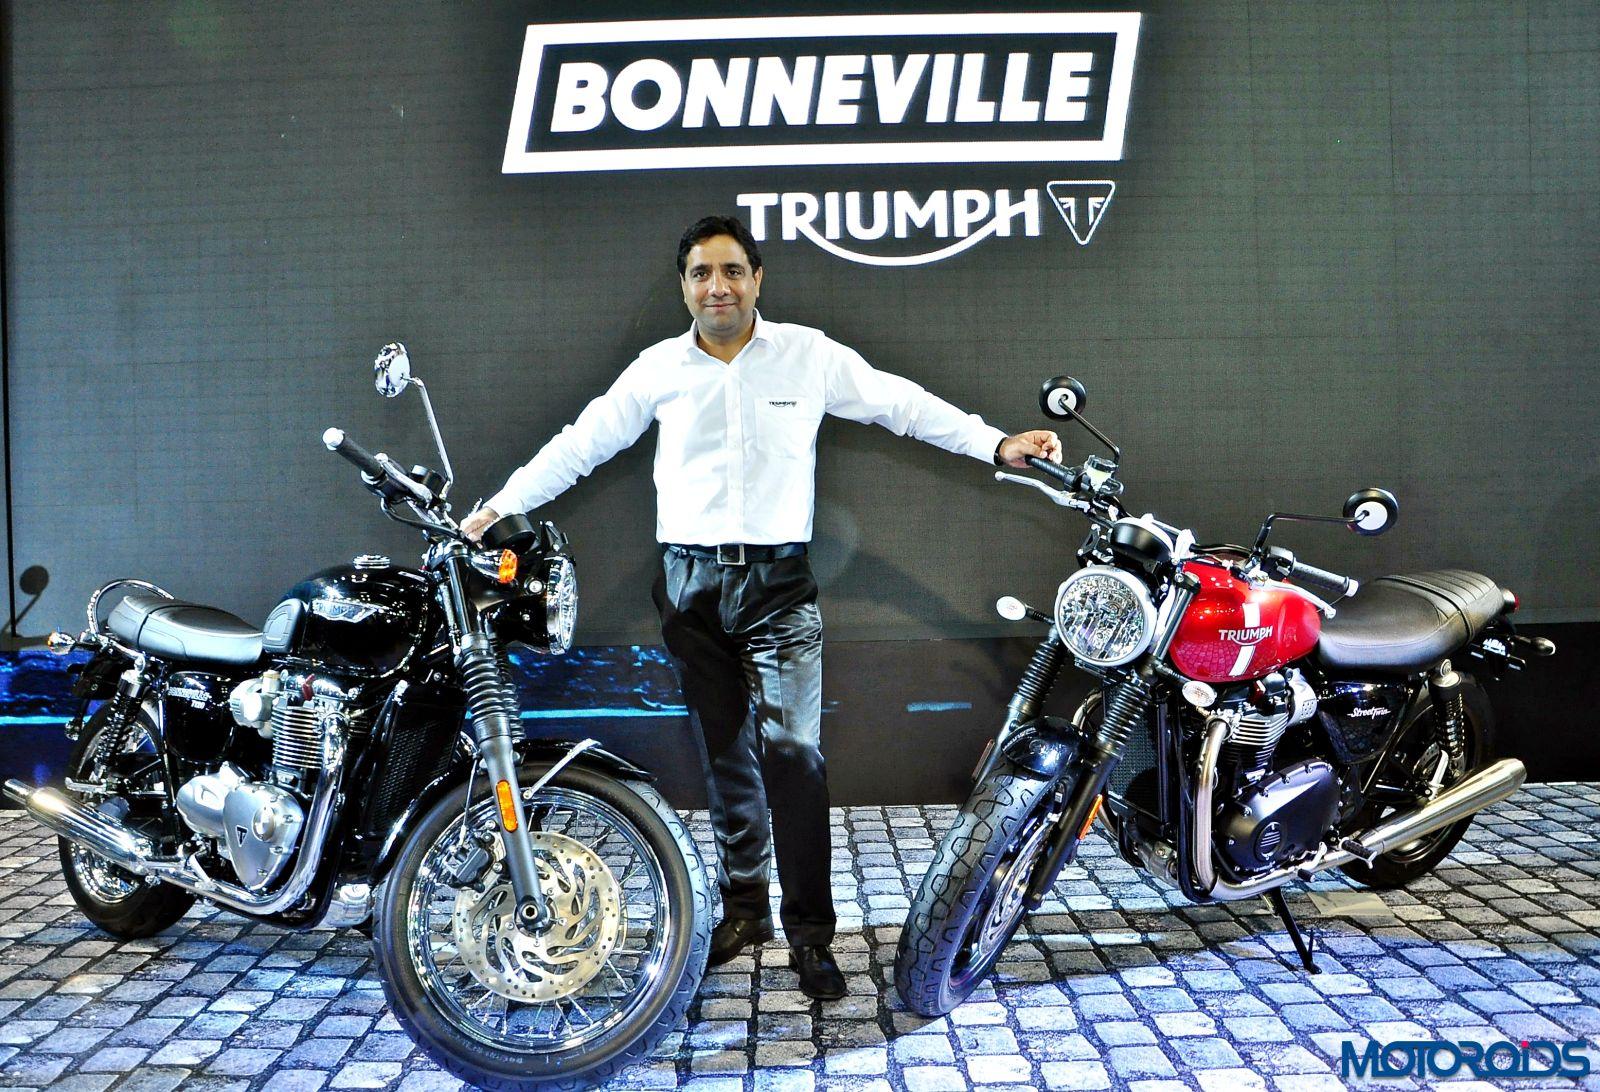 New 2016 Bonneville Range - Auto Expo 2016 (2)